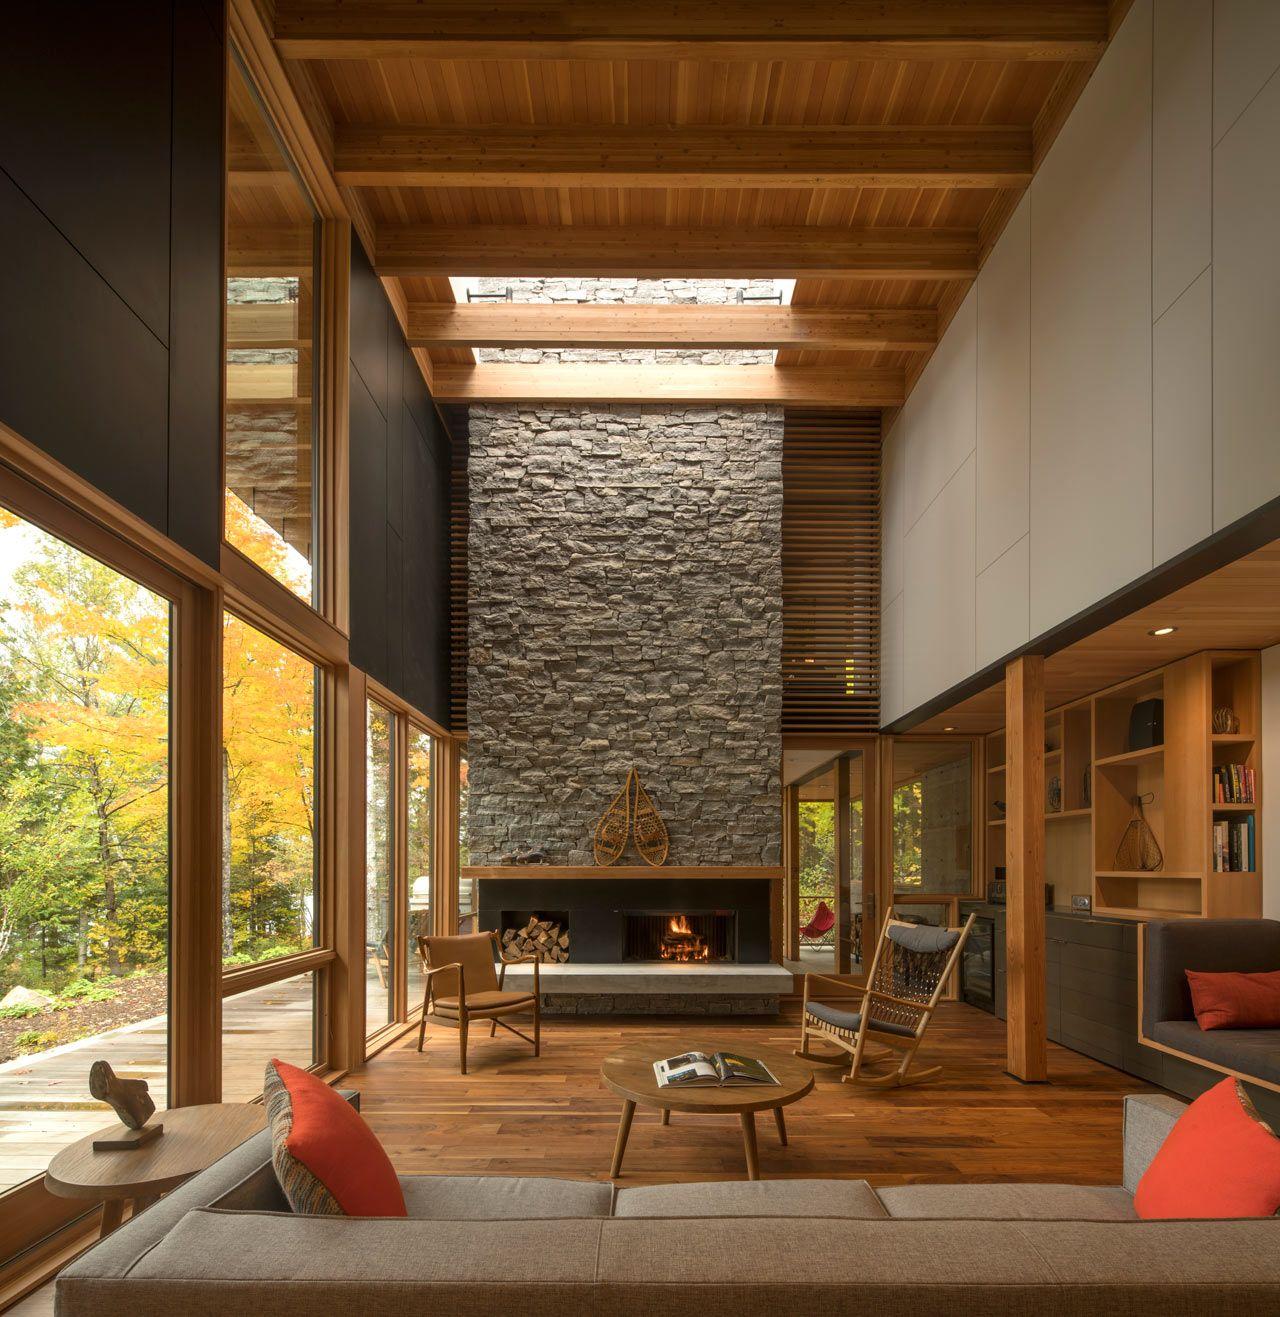 Interior Design Vs Architecture Reddit: A Luxury, Wooded, Lakeside Retreat Northeast Of Toronto